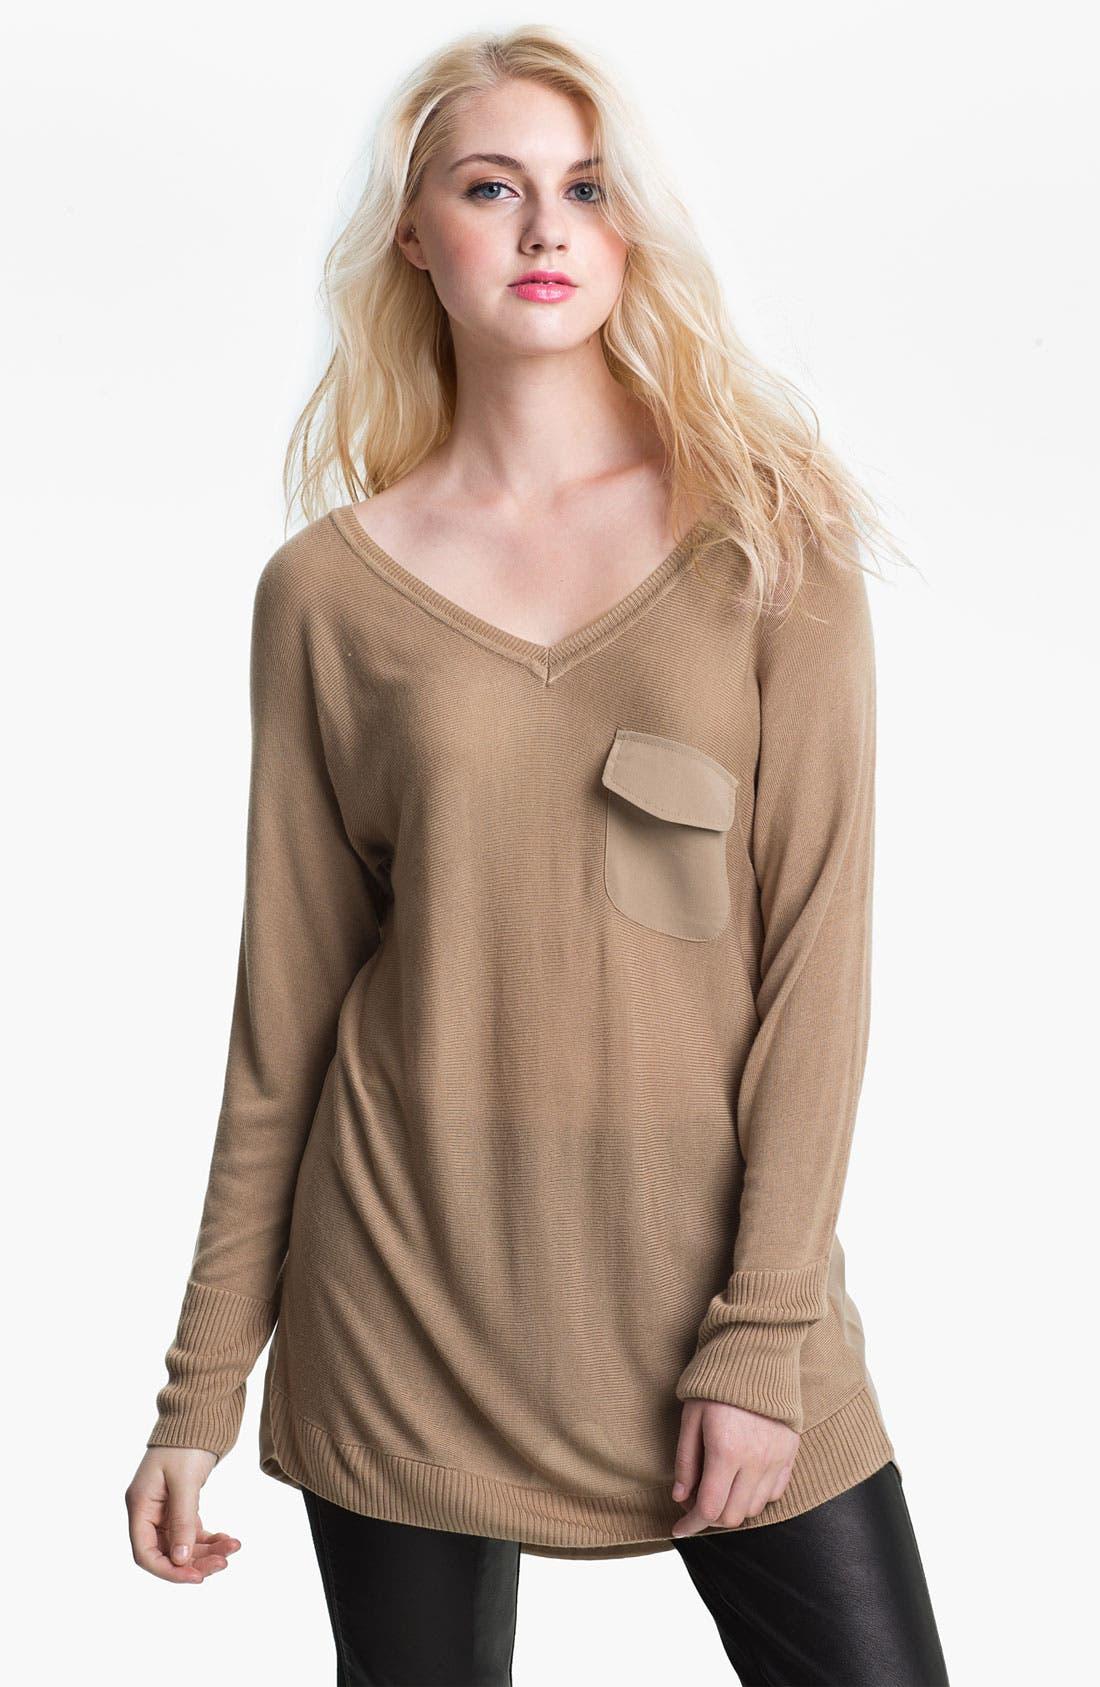 Alternate Image 1 Selected - Max & Mia V-Neck Chiffon Back Sweater